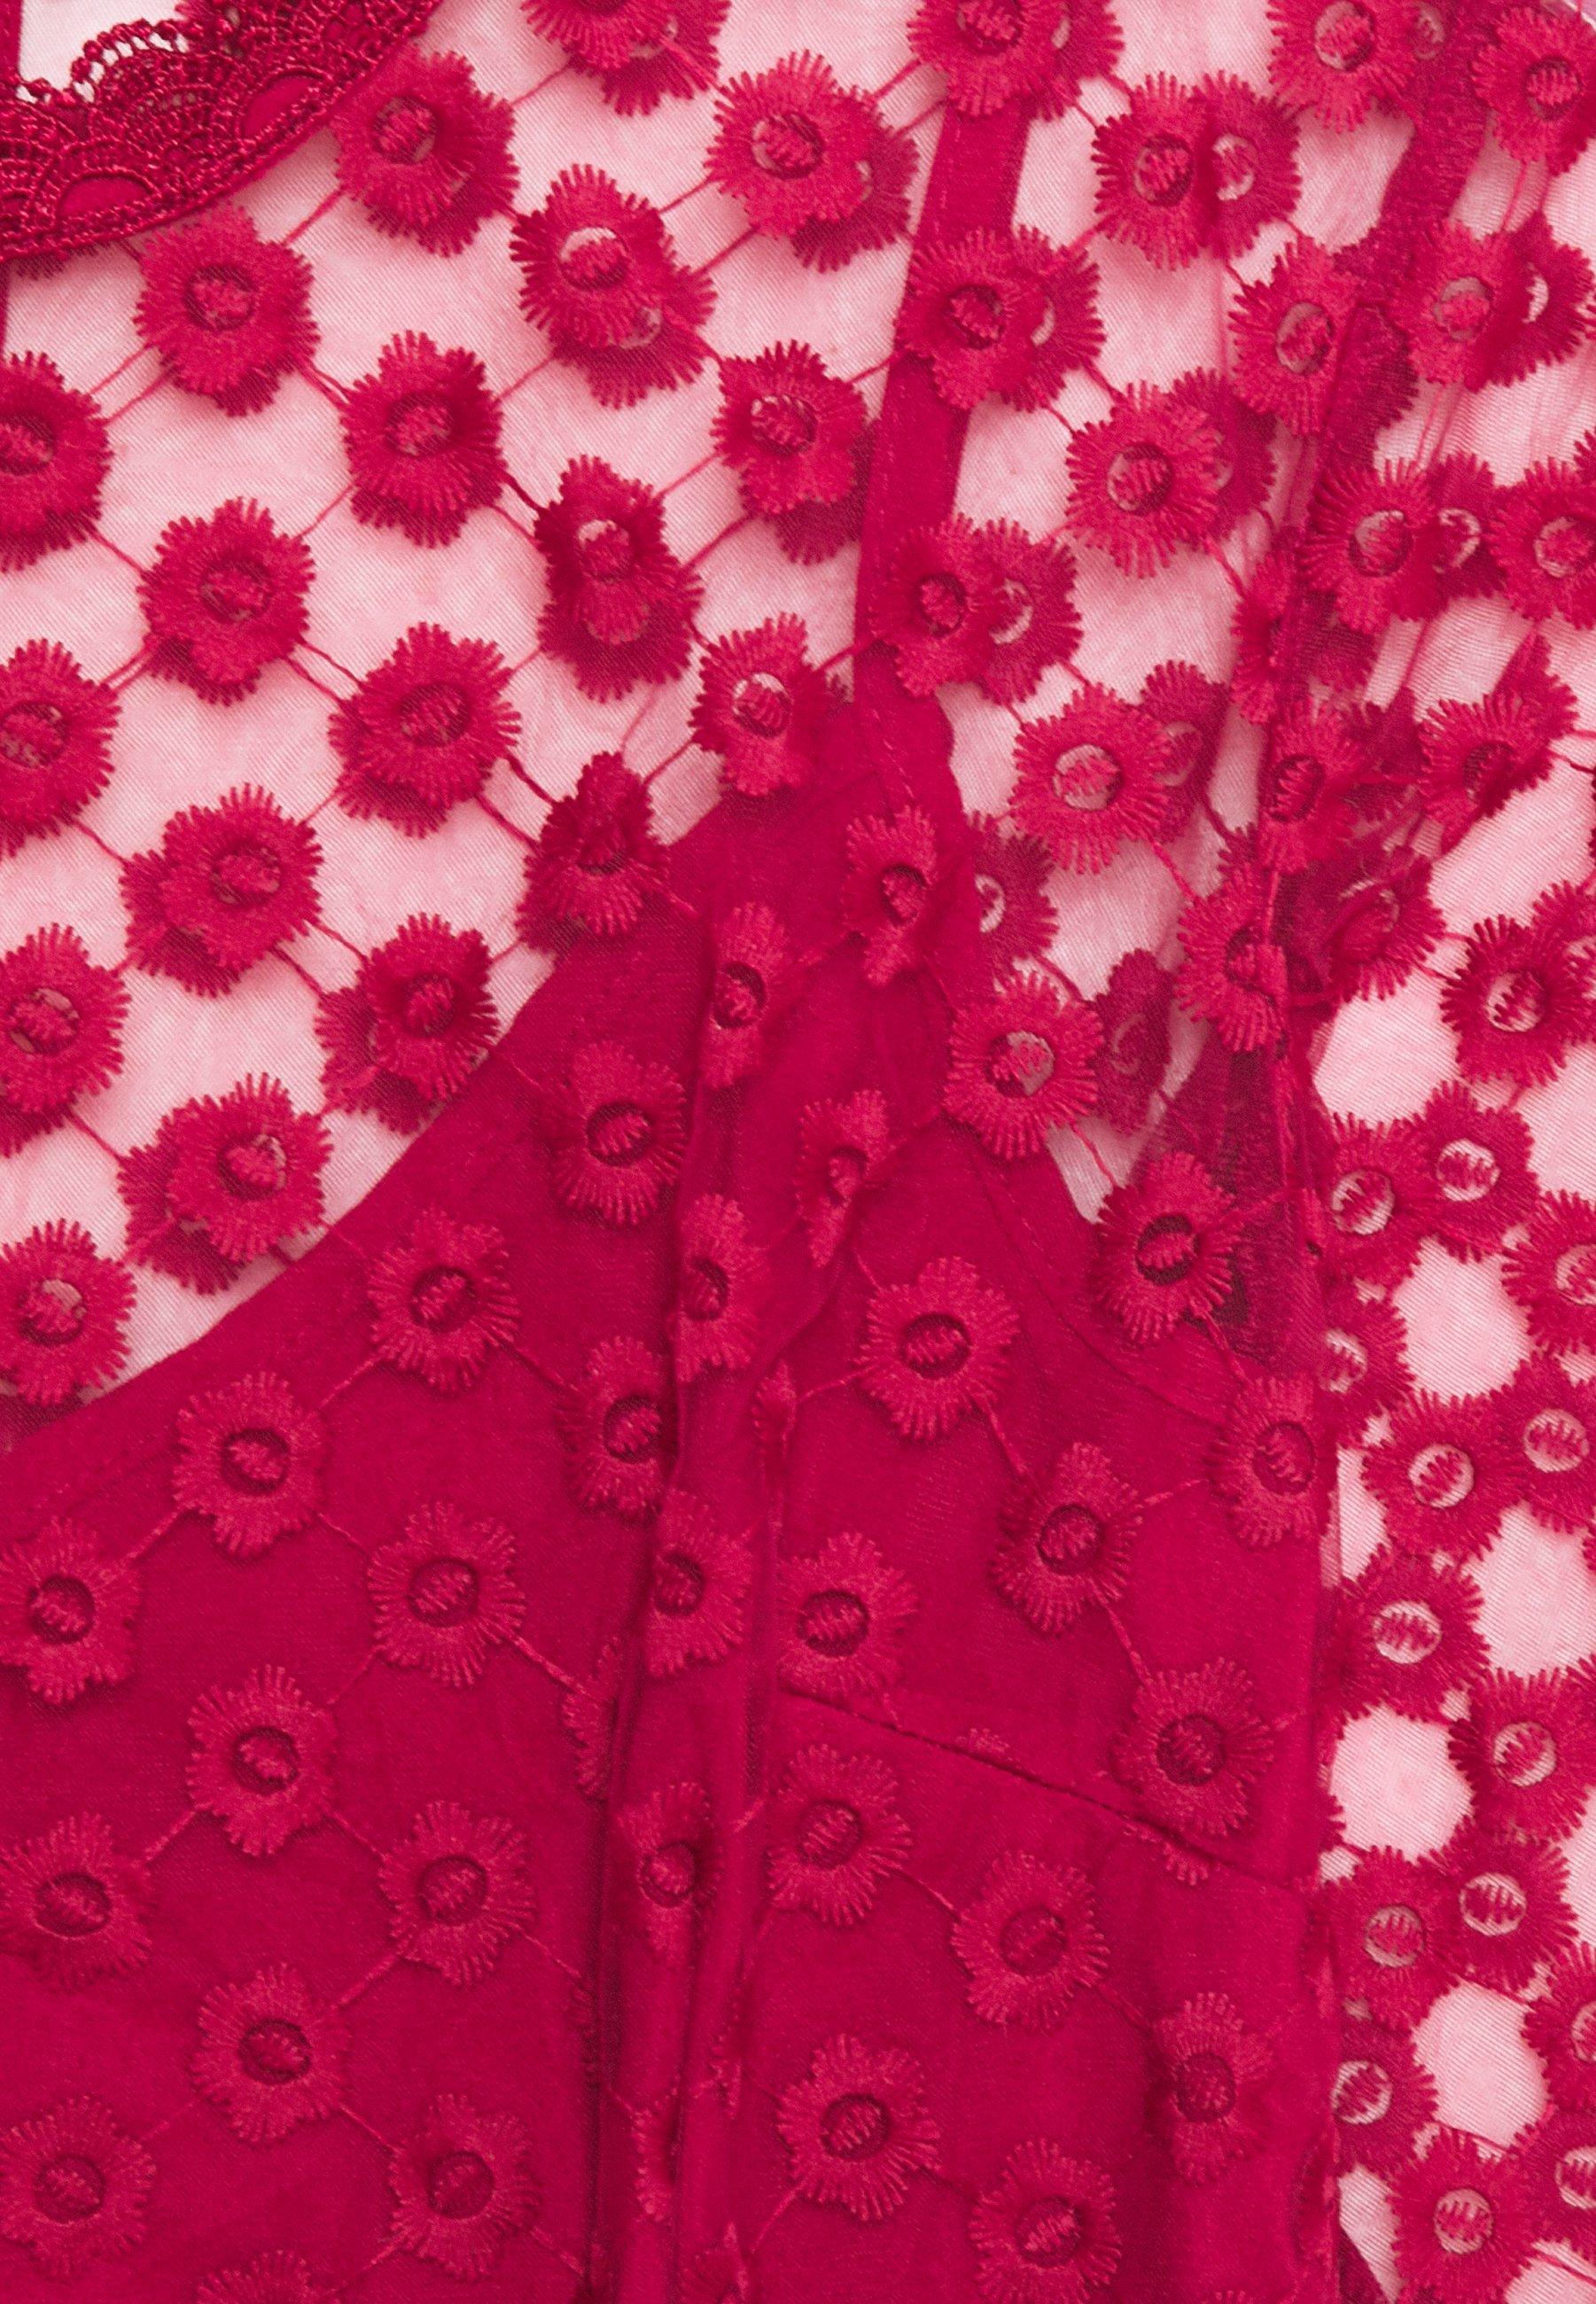 Explore Cheap Women's Clothing Little Mistress Tall Day dress chilli m3iZSbicE HhqRyDh4H